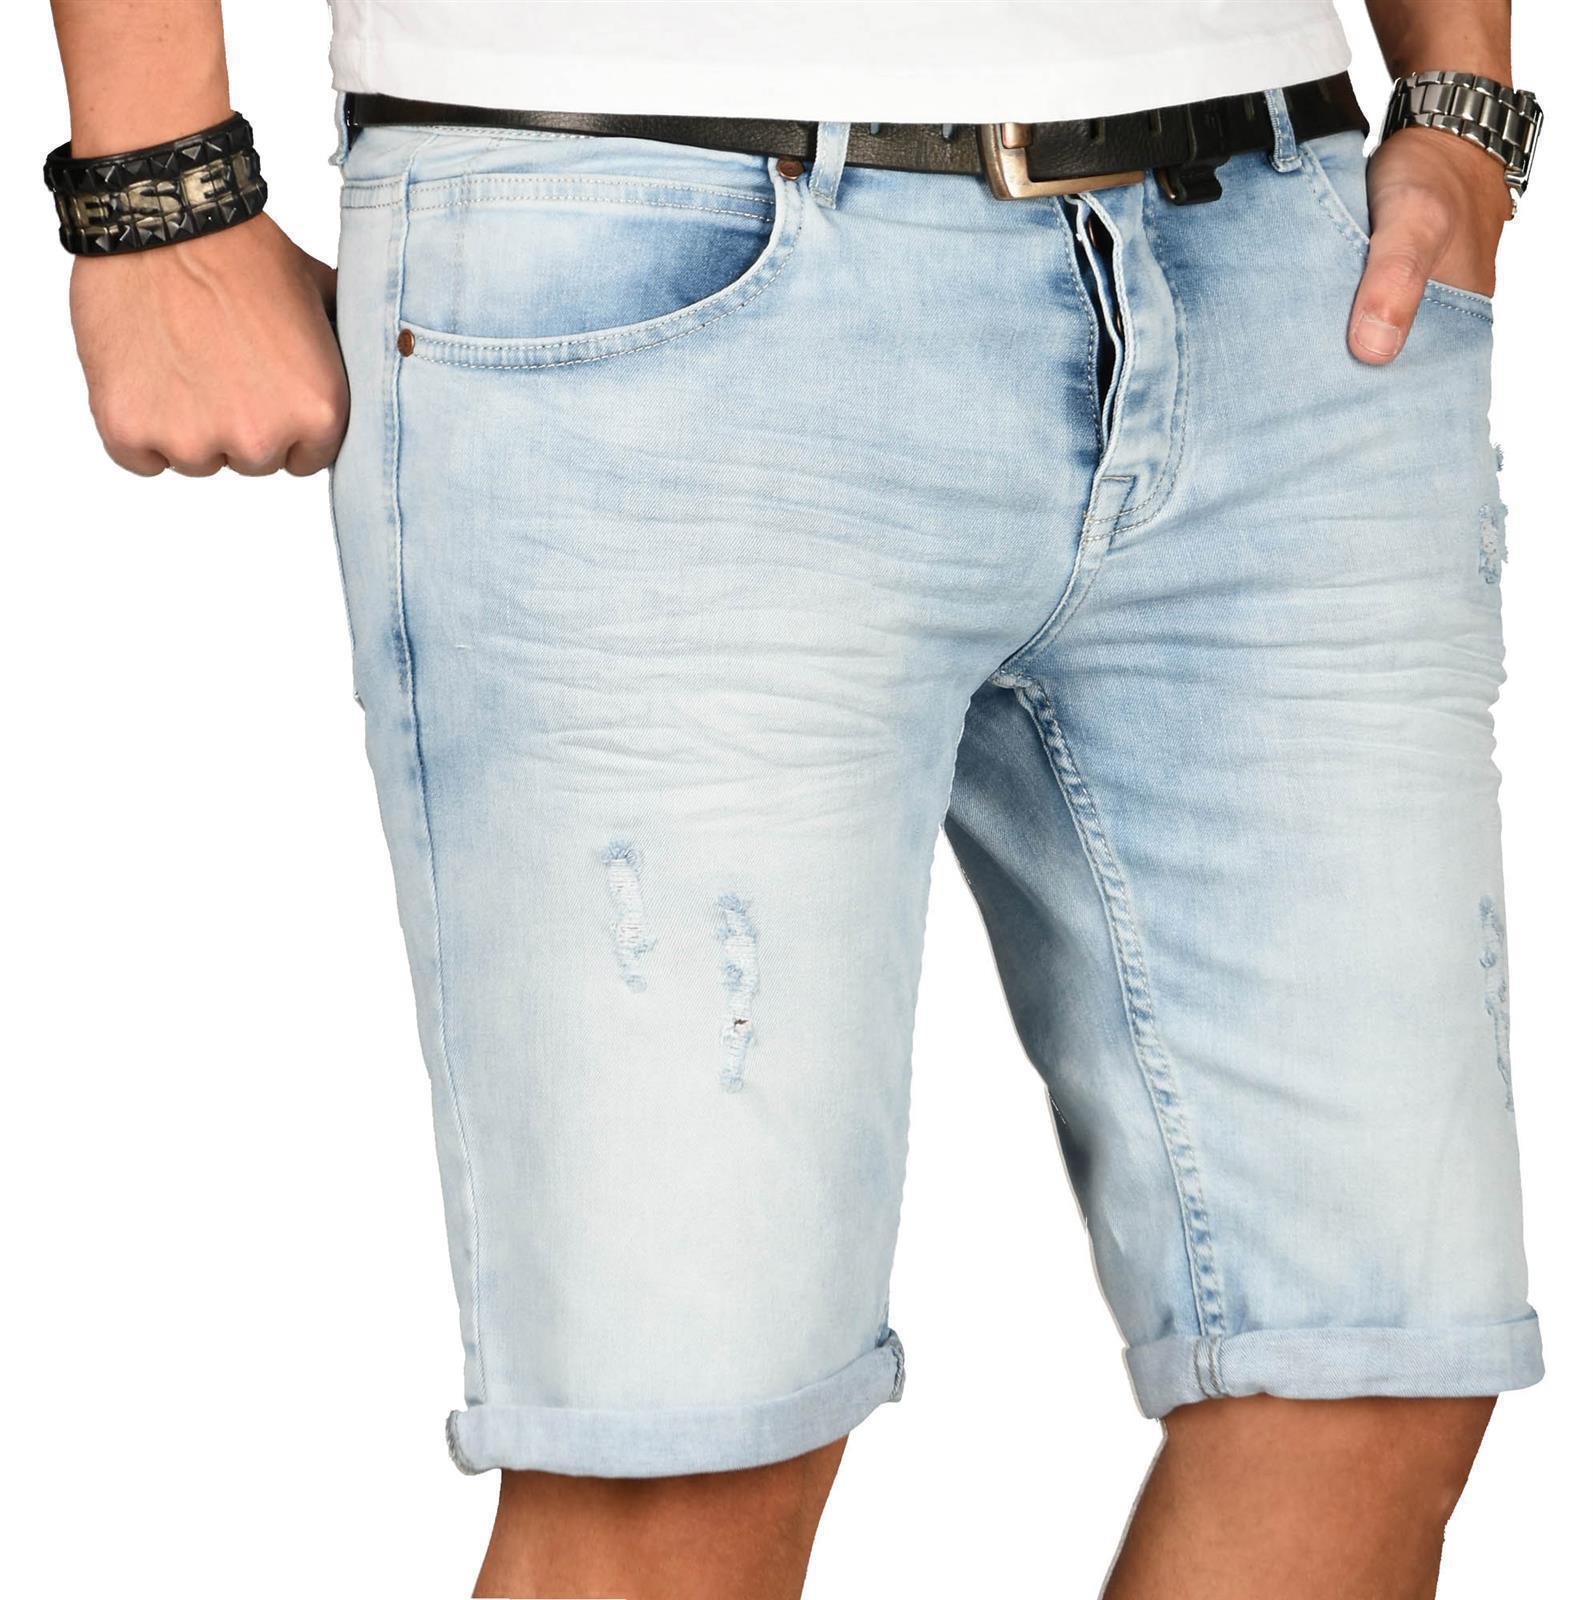 A-Salvarini-Herren-Designer-Jeans-Short-kurze-Hose-Slim-Sommer-Shorts-Washed Indexbild 11